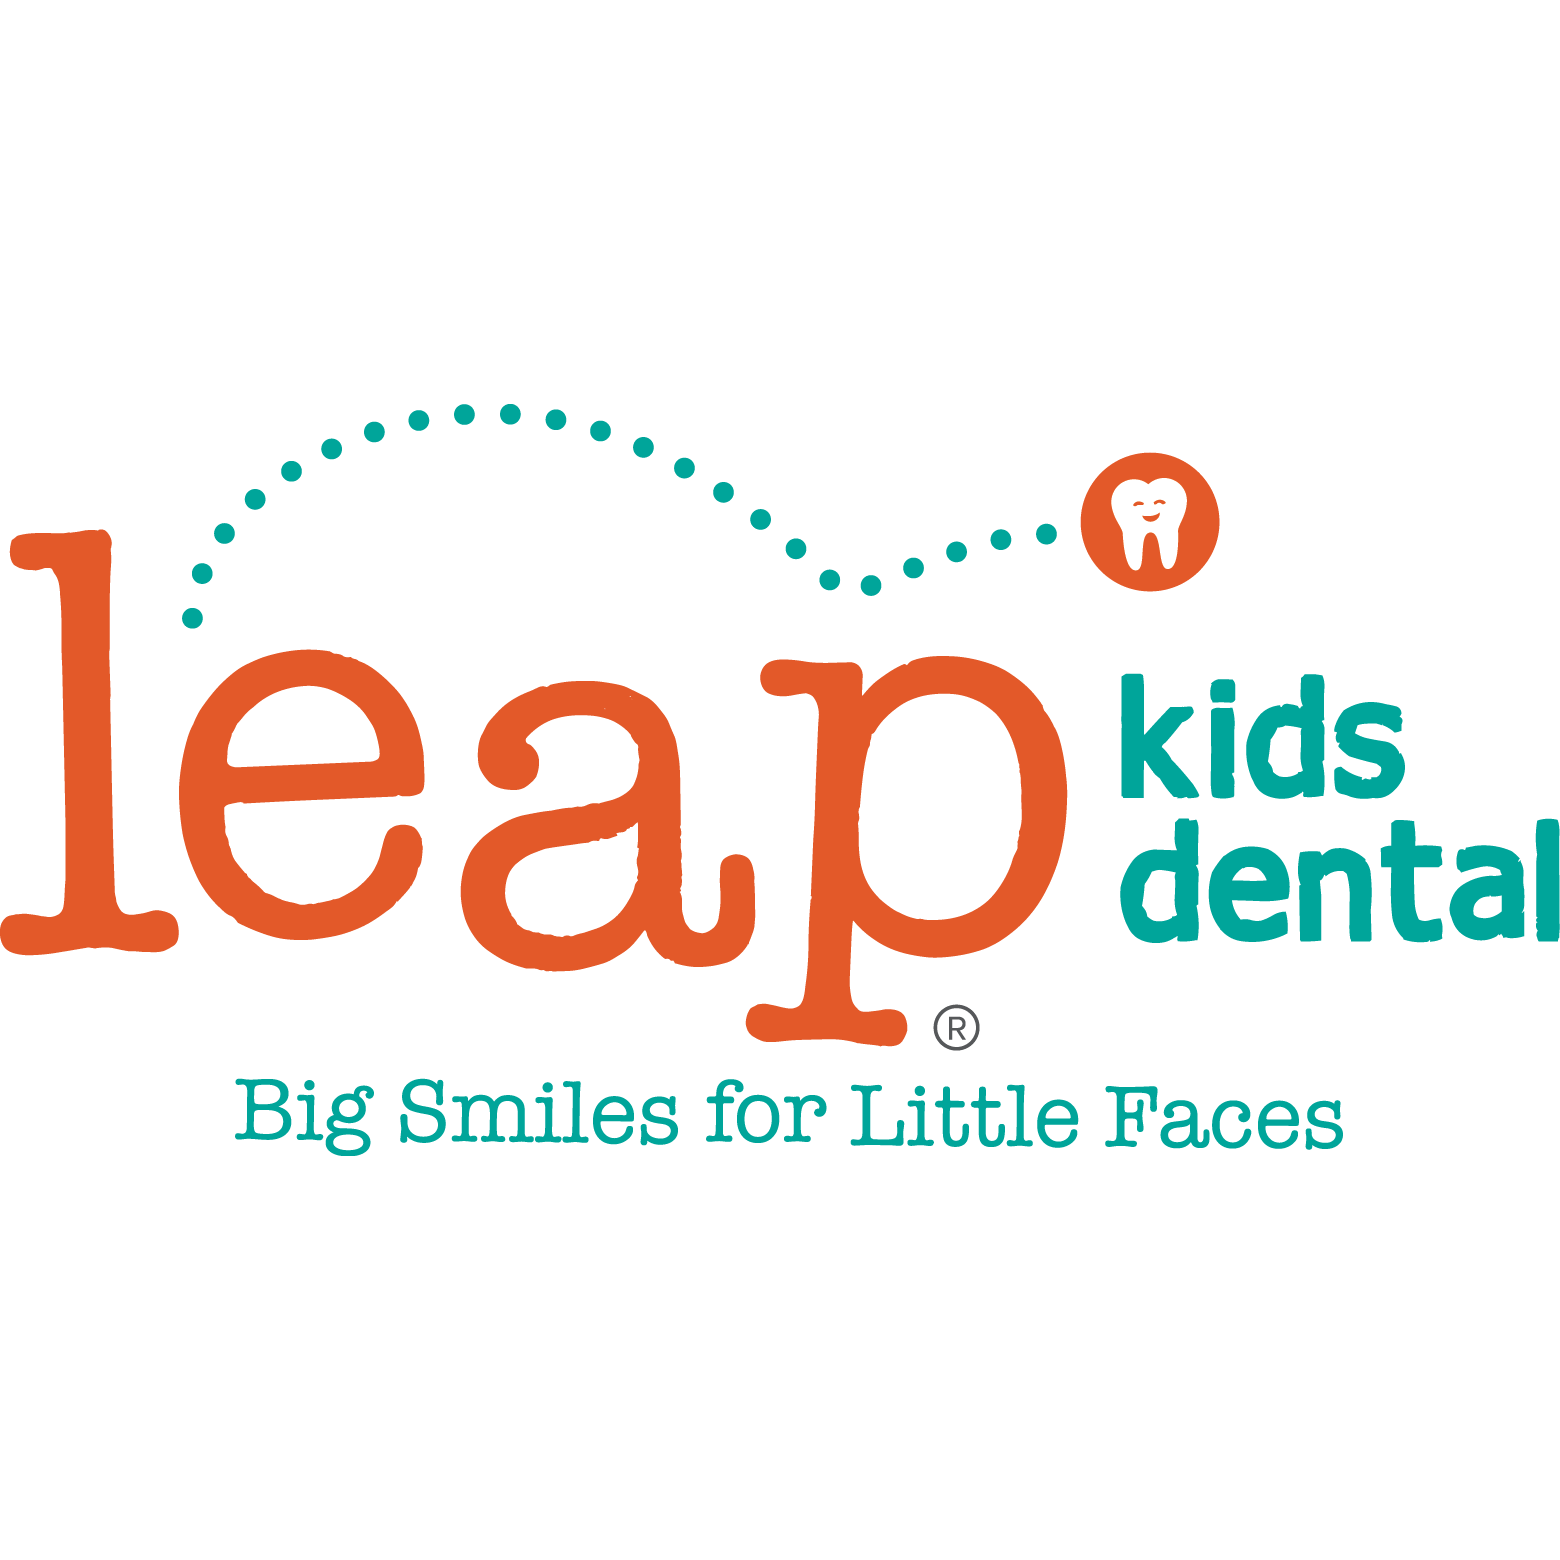 Leap Kids Dental